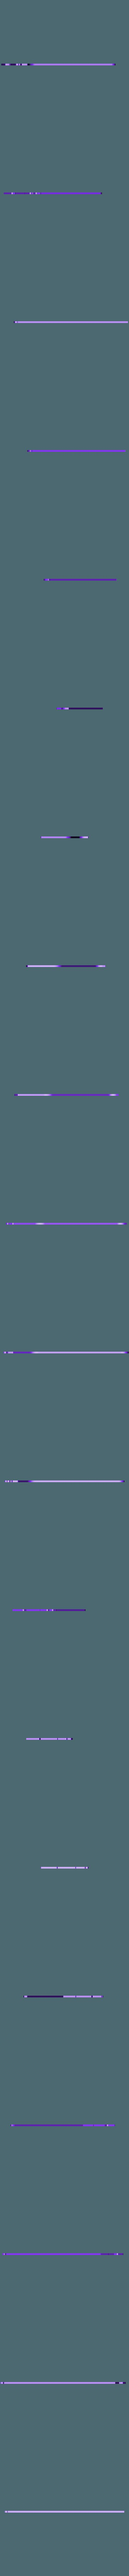 Escuadra_18_cm_v1.stl Download free STL file Shelf bracket set for single track slot • 3D printer design, dancingchicken